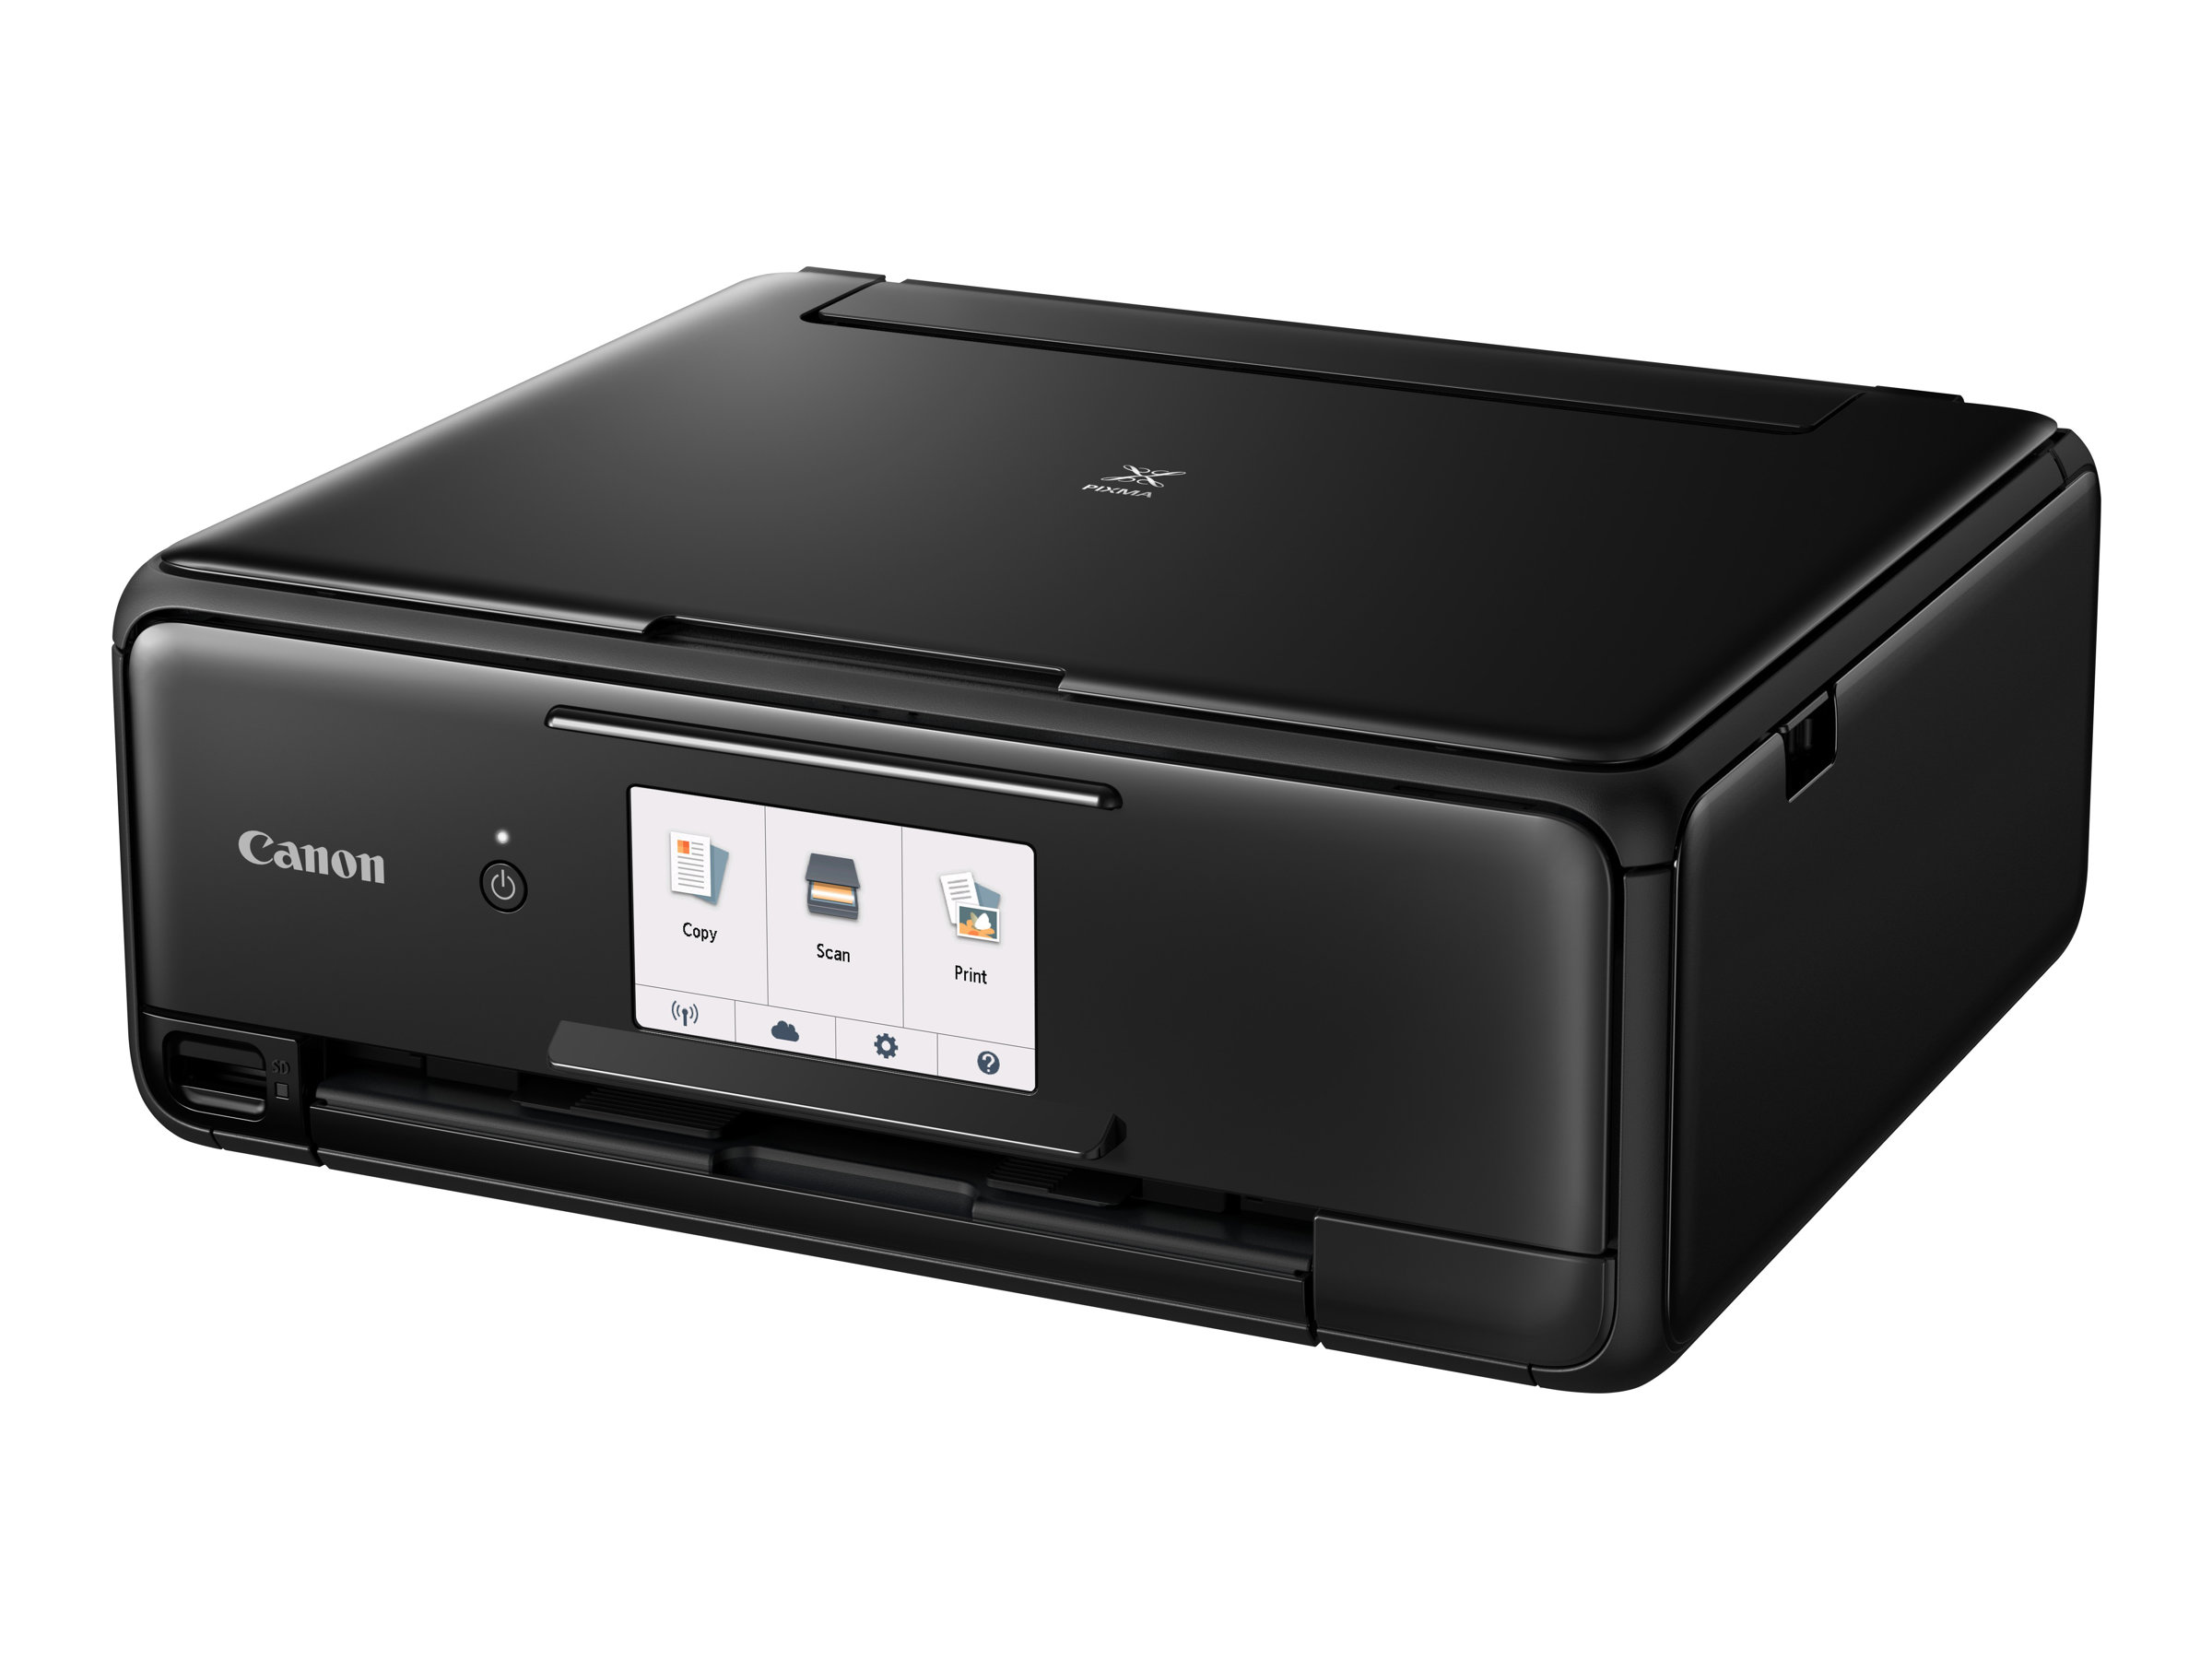 Canon PIXMA TS8150 - Multifunktionsdrucker - Farbe - Tintenstrahl - 216 x 297 mm (Original)